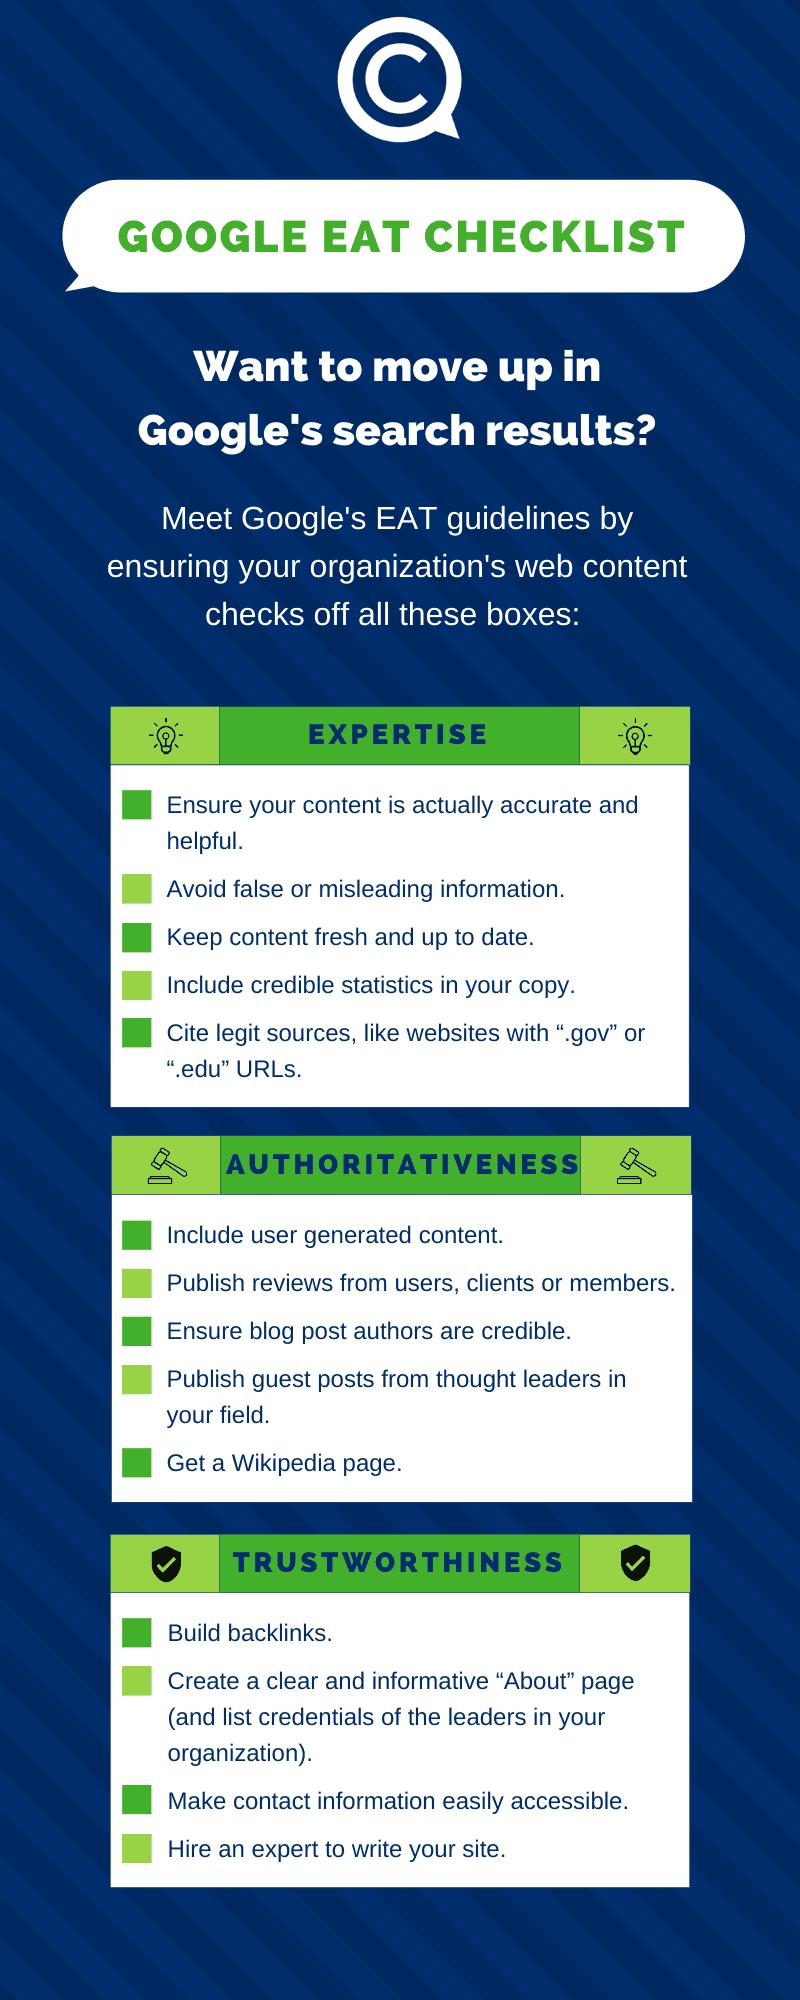 Google EAT checklist